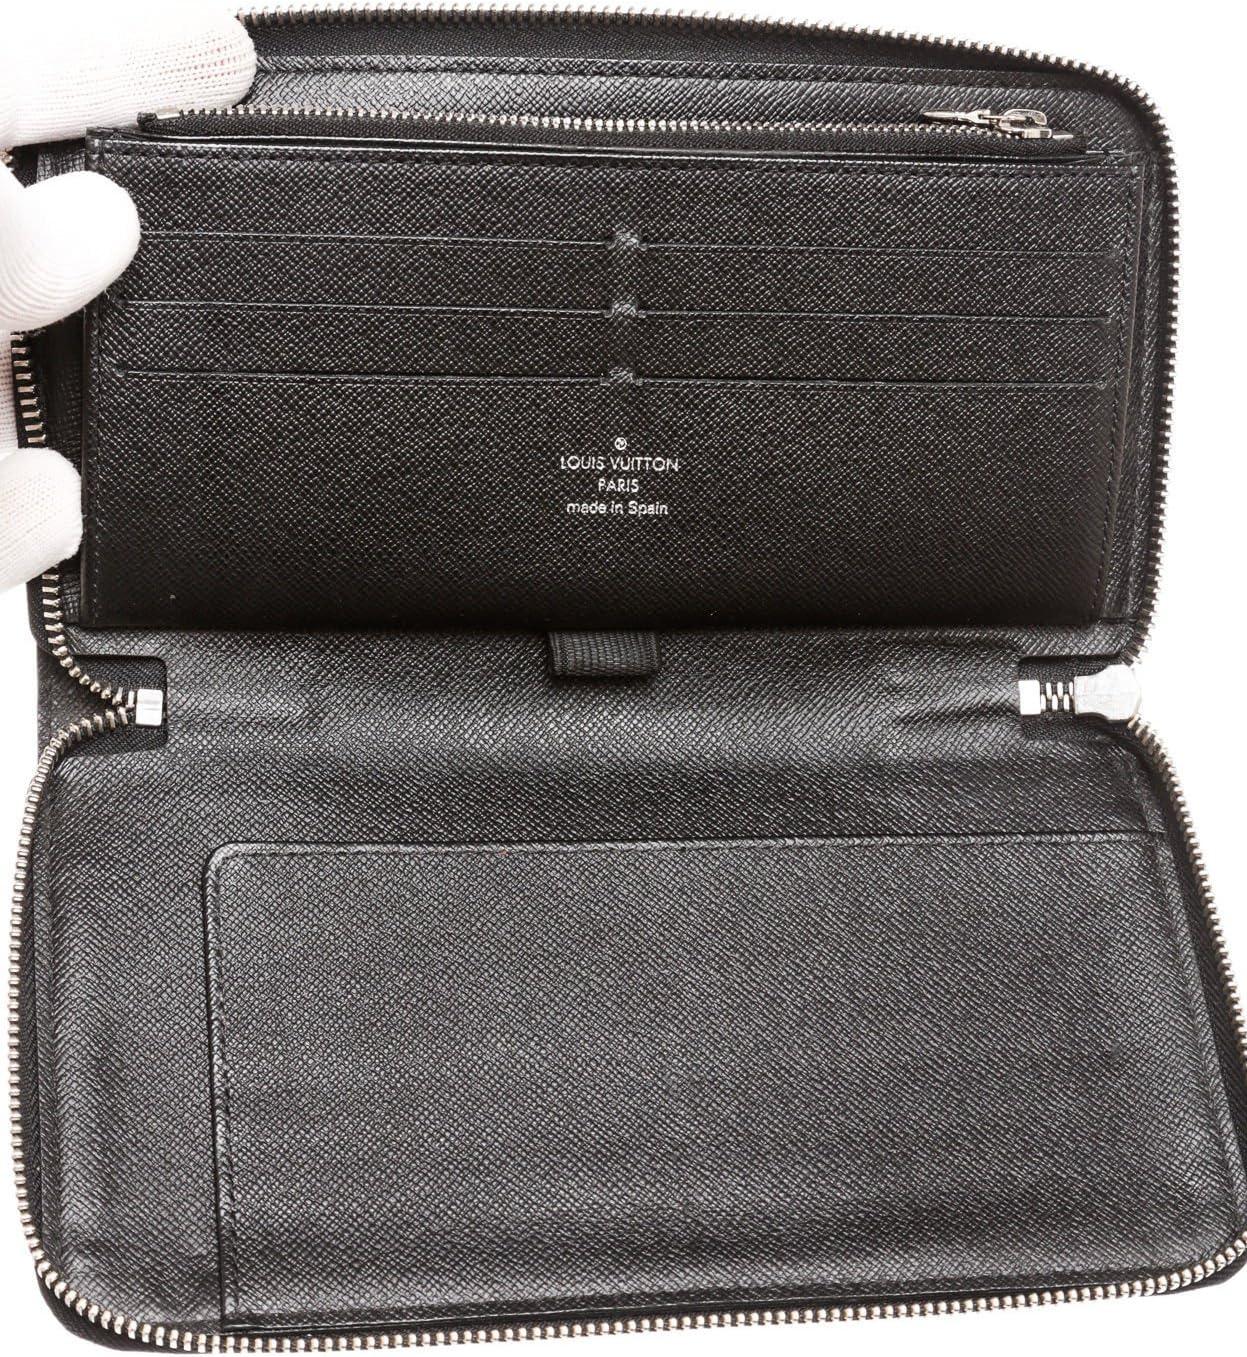 Louis Vuitton - Bolso mochila para mujer gris gris: Amazon.es: Equipaje